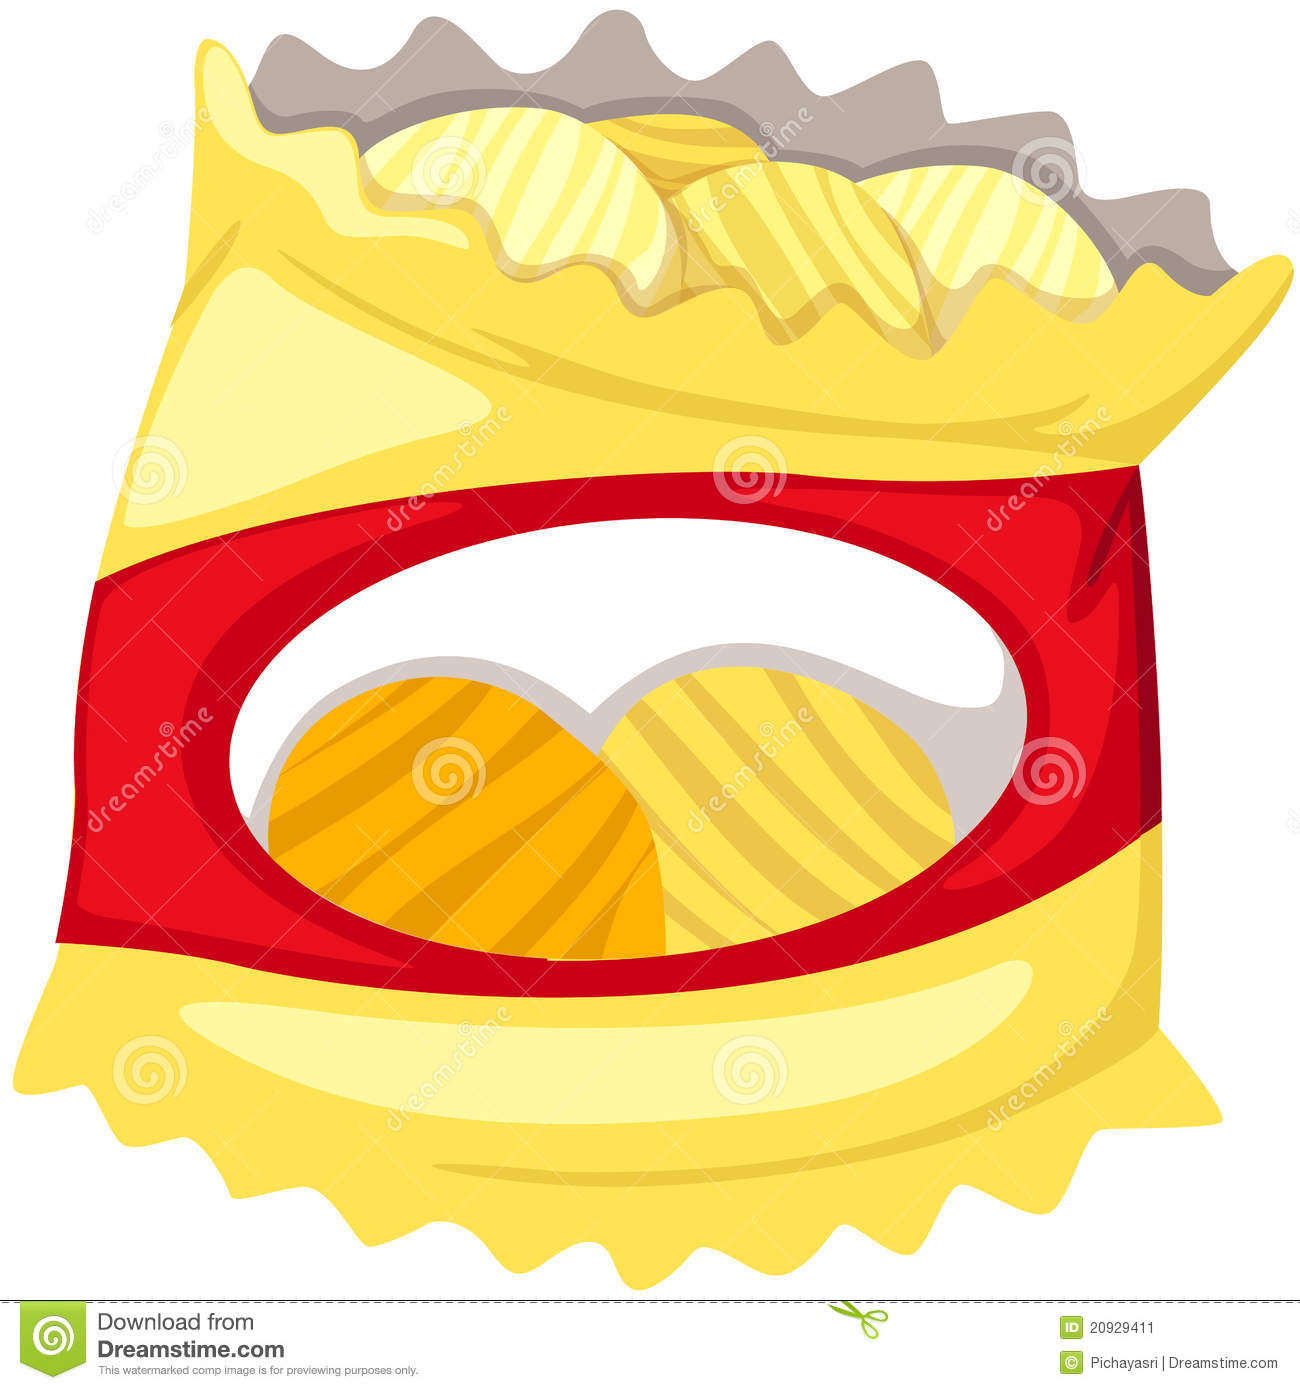 Chips clipart animated. Potato no